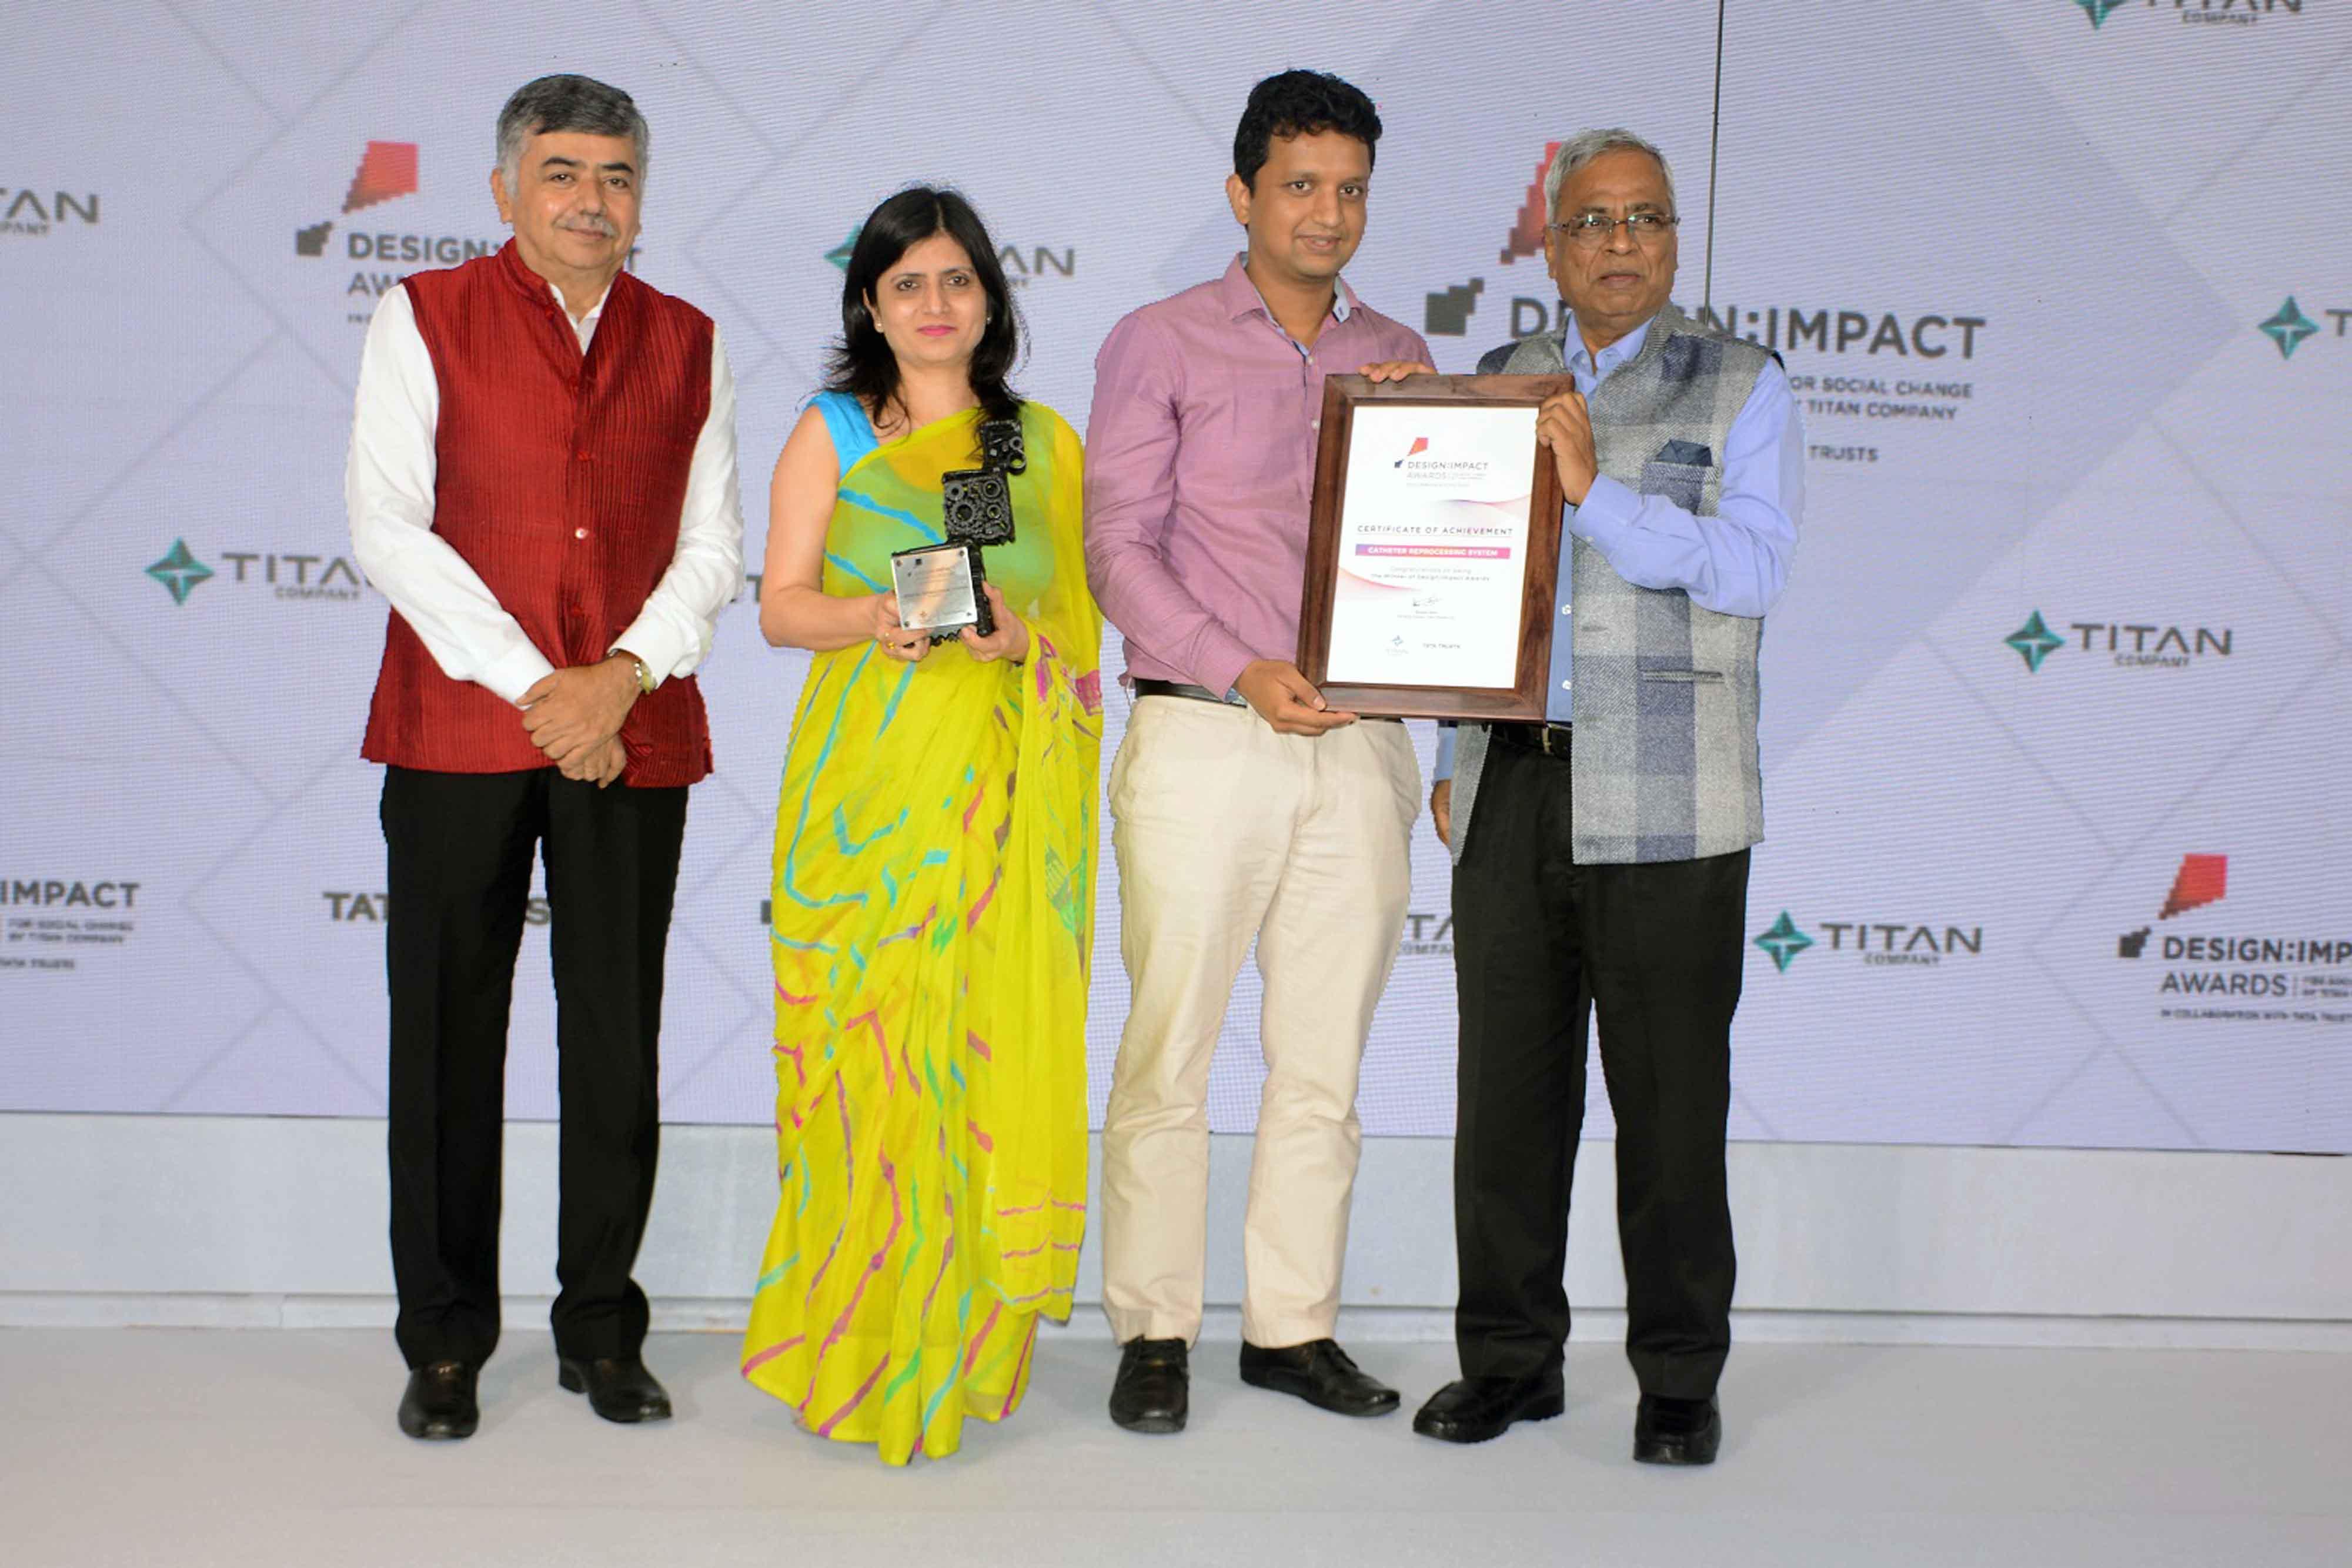 Vikram Goel & Rajwinder Kaur Catheter Reprocessing System